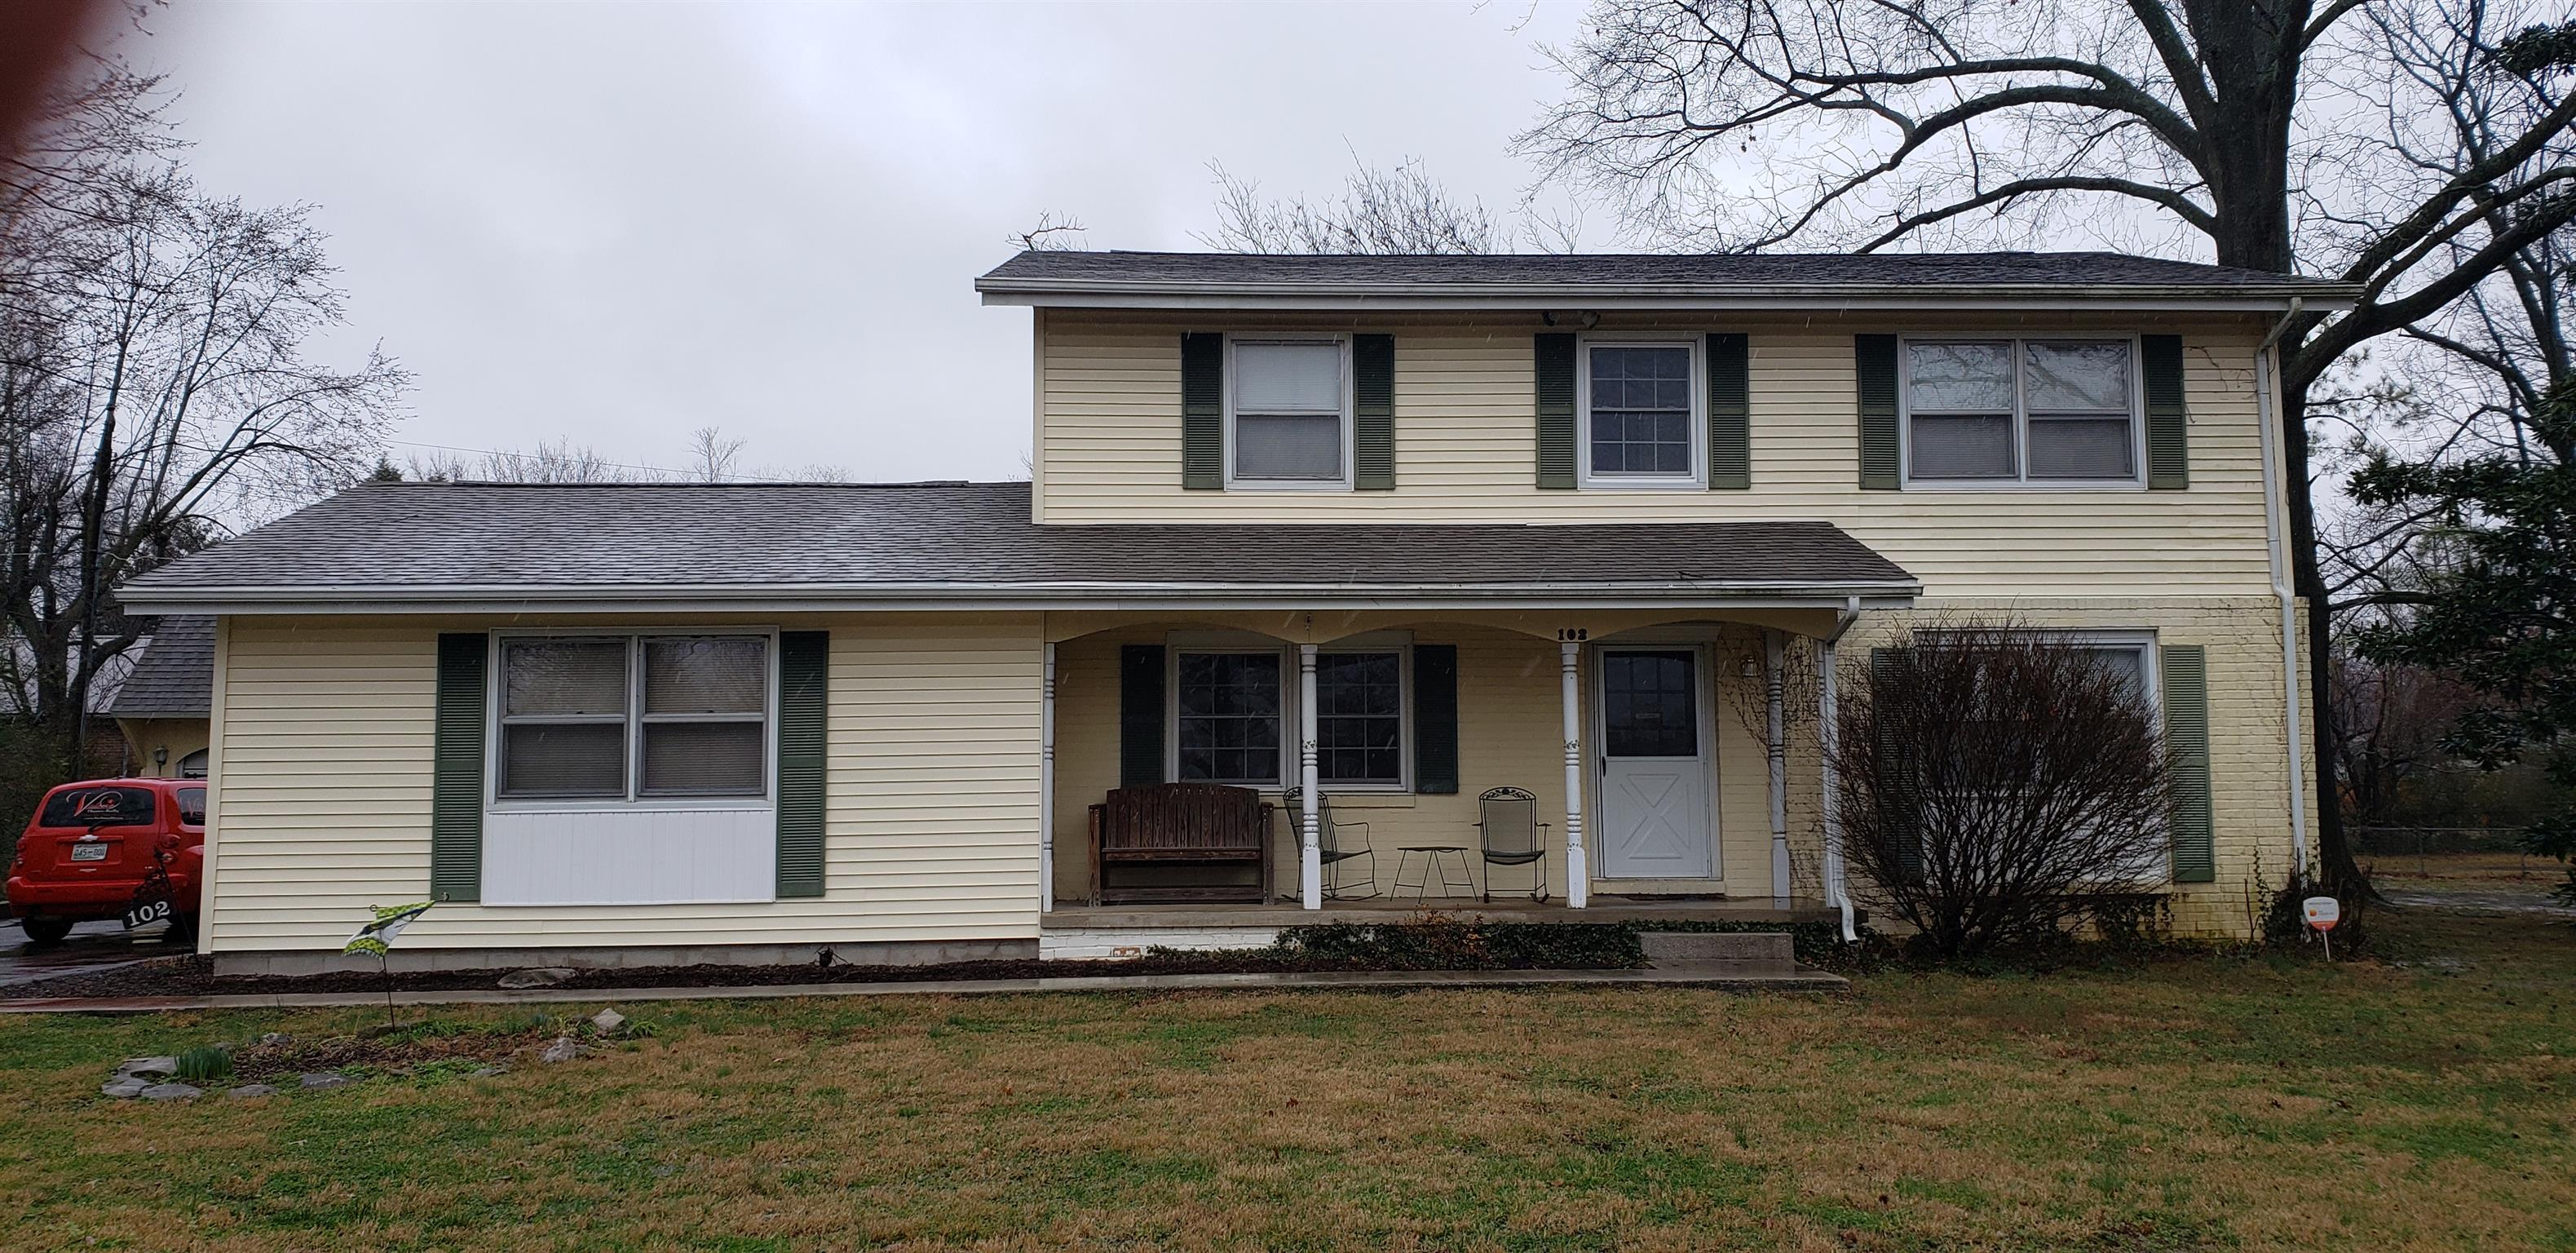 102 Sunset Circle S, Hopkinsville, KY 42240 - Hopkinsville, KY real estate listing